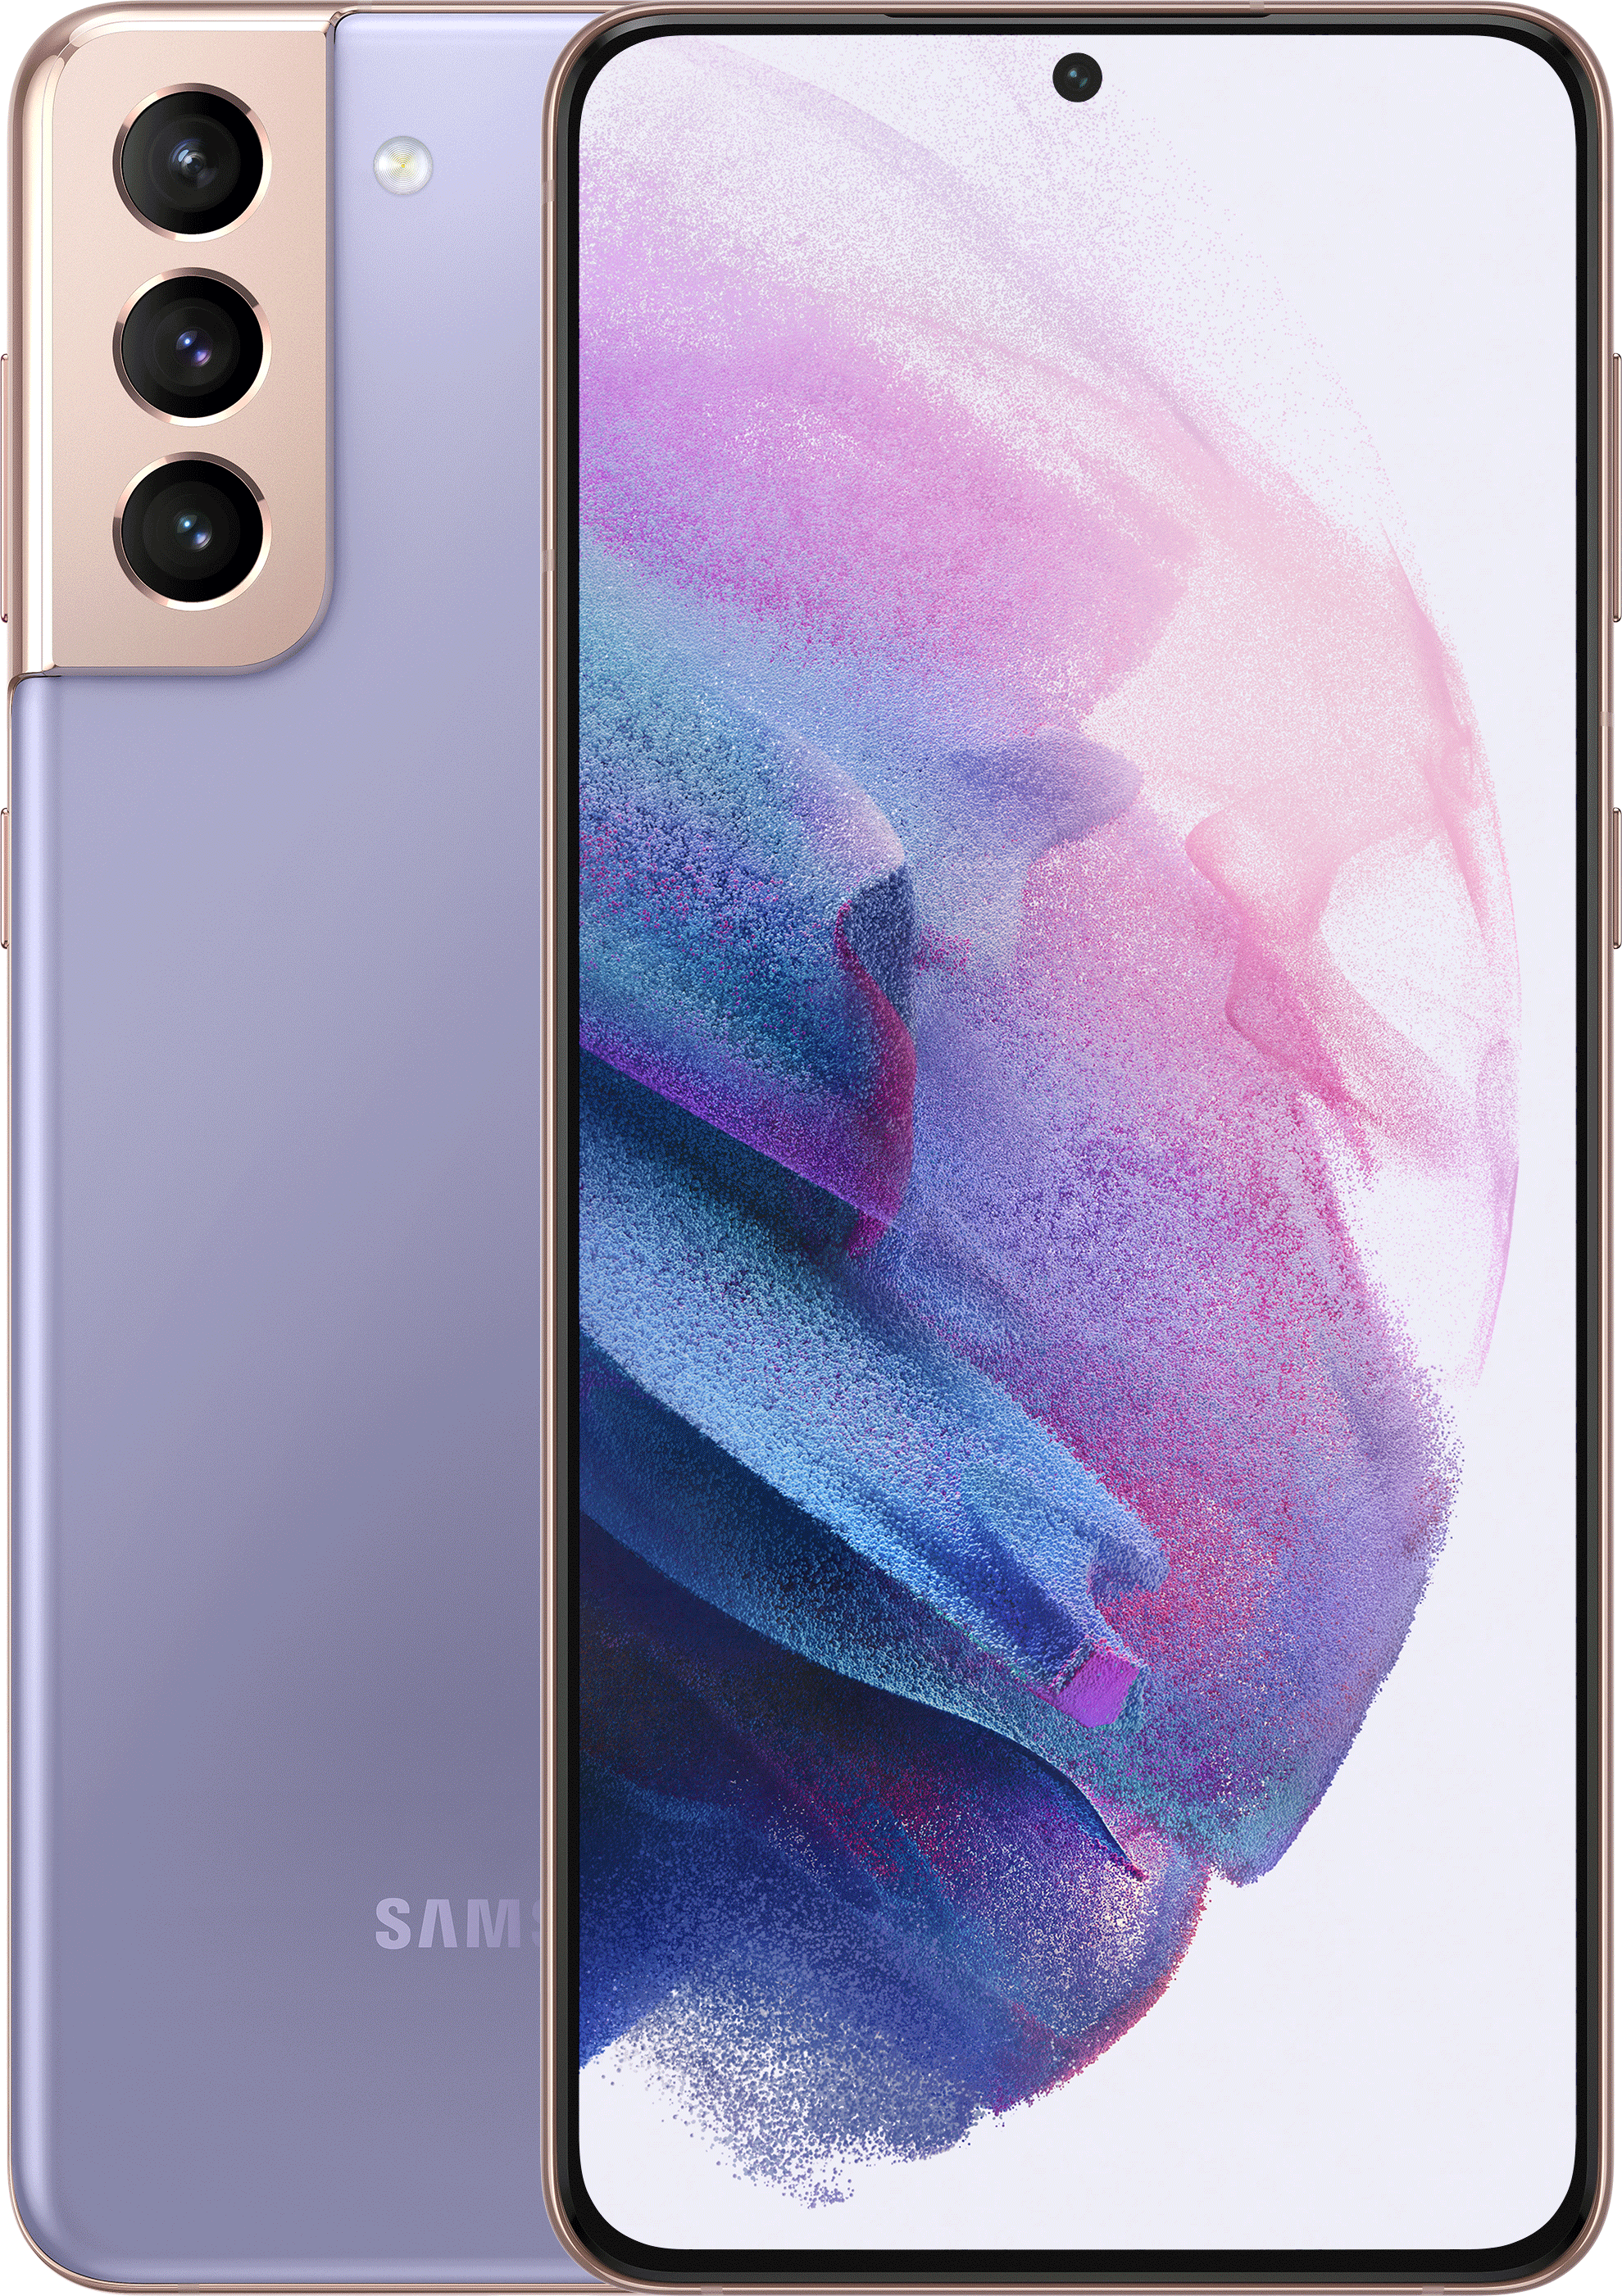 SAMSUNG Galaxy S21 Plus 5G – 256 GB Violet